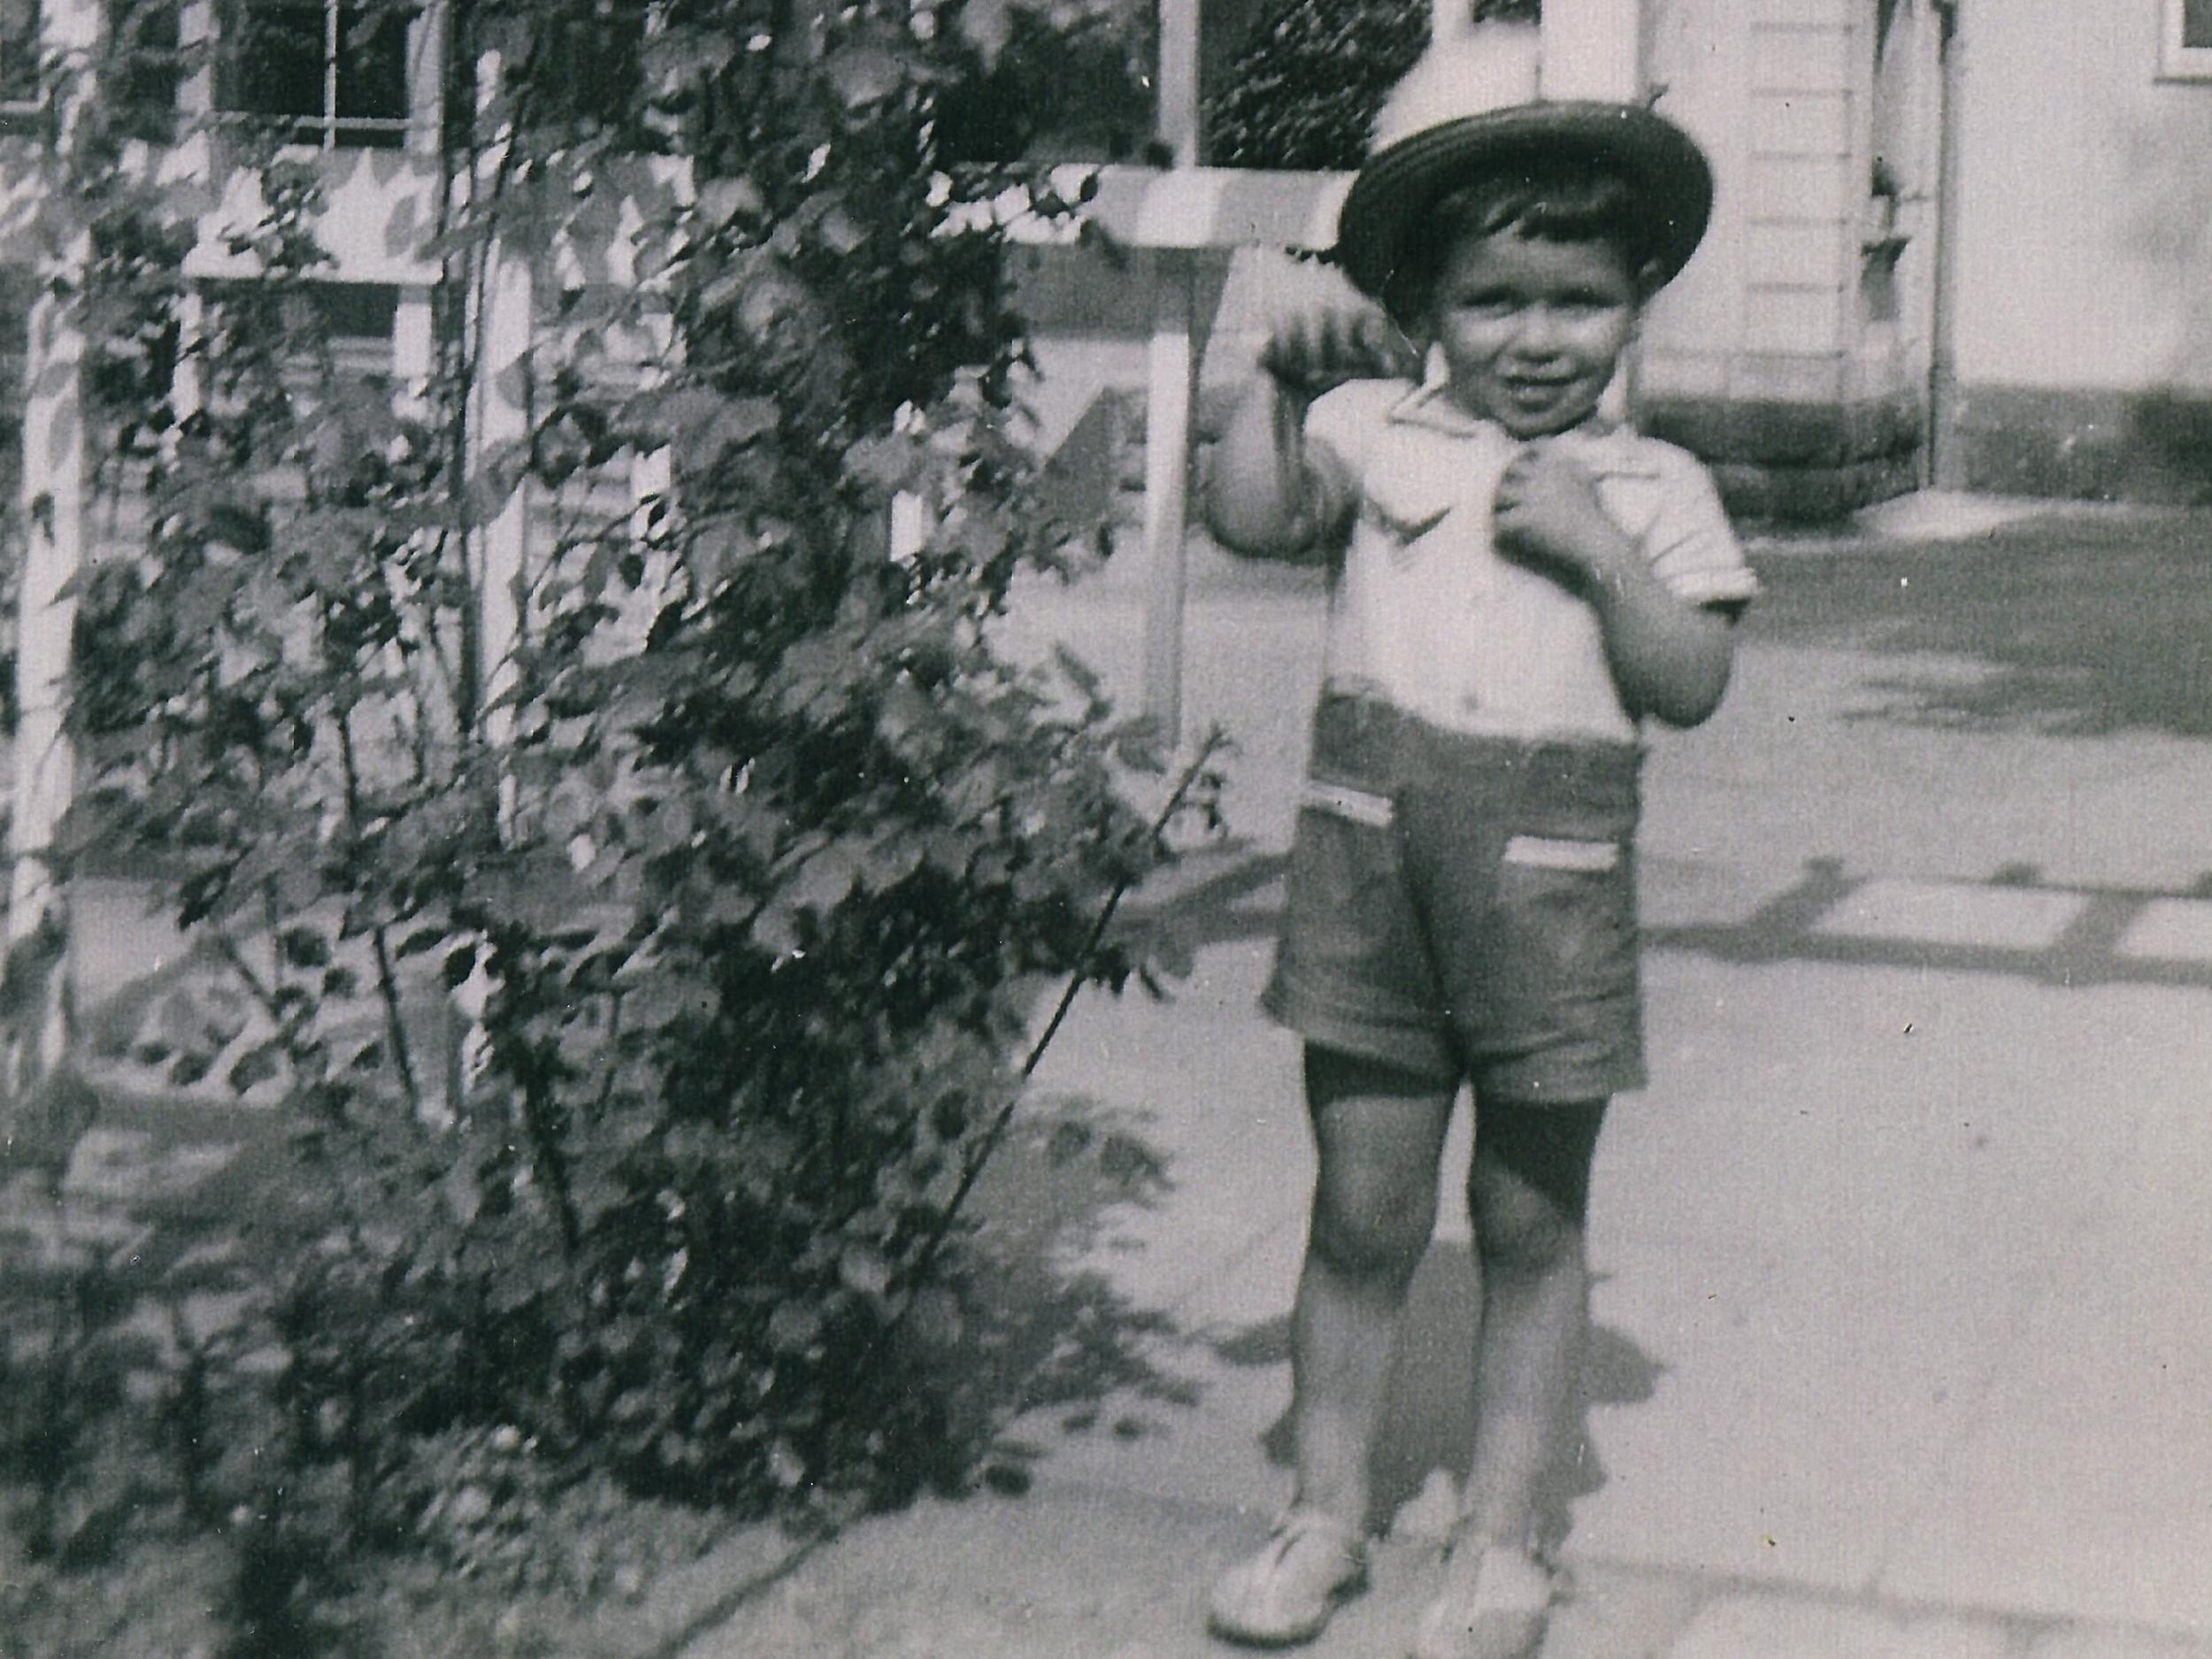 Our father - Arturo Castellanos in Hamburg (courtesy of Blanca Castellanos)